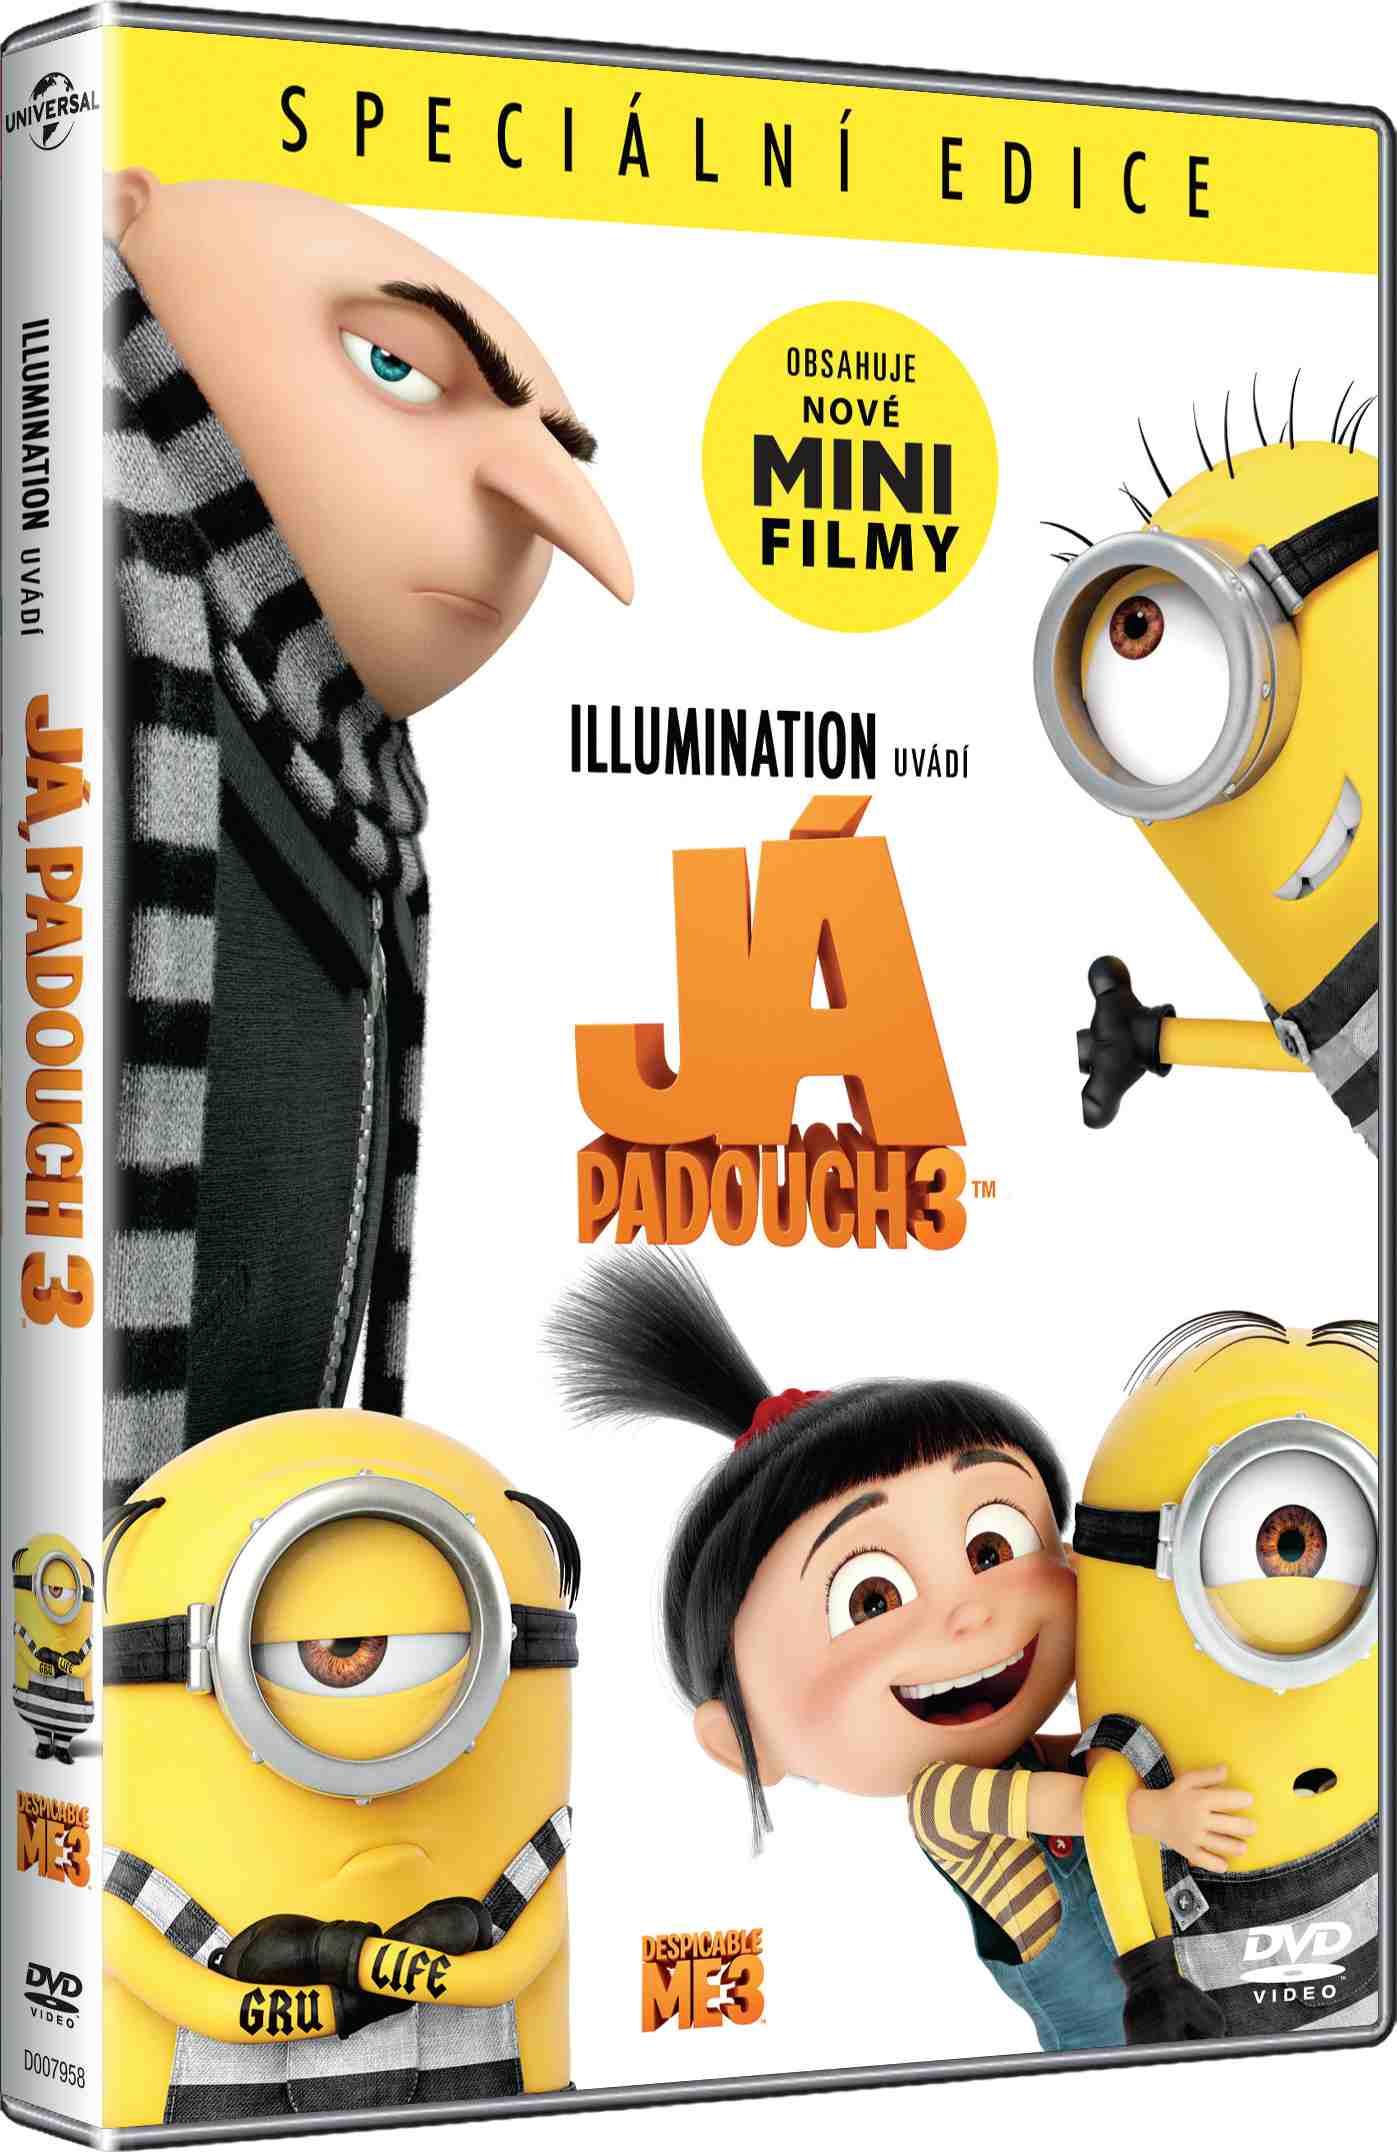 JÁ, PADOUCH 3 - DVD